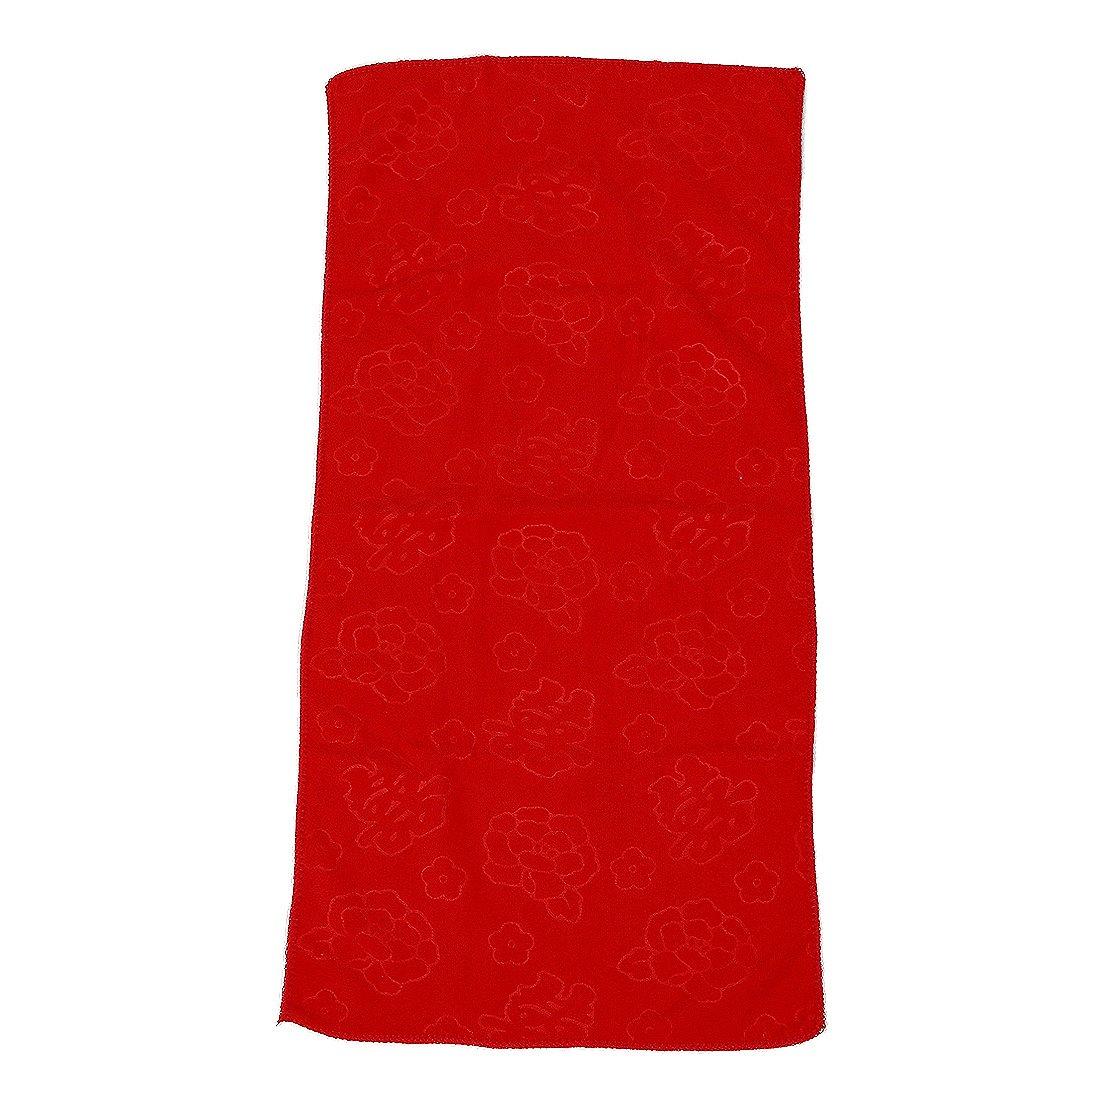 TOOGOO(R) Red Chinese Style Pyrographic Cotton Bath Towel Bathroom Wedding Gift